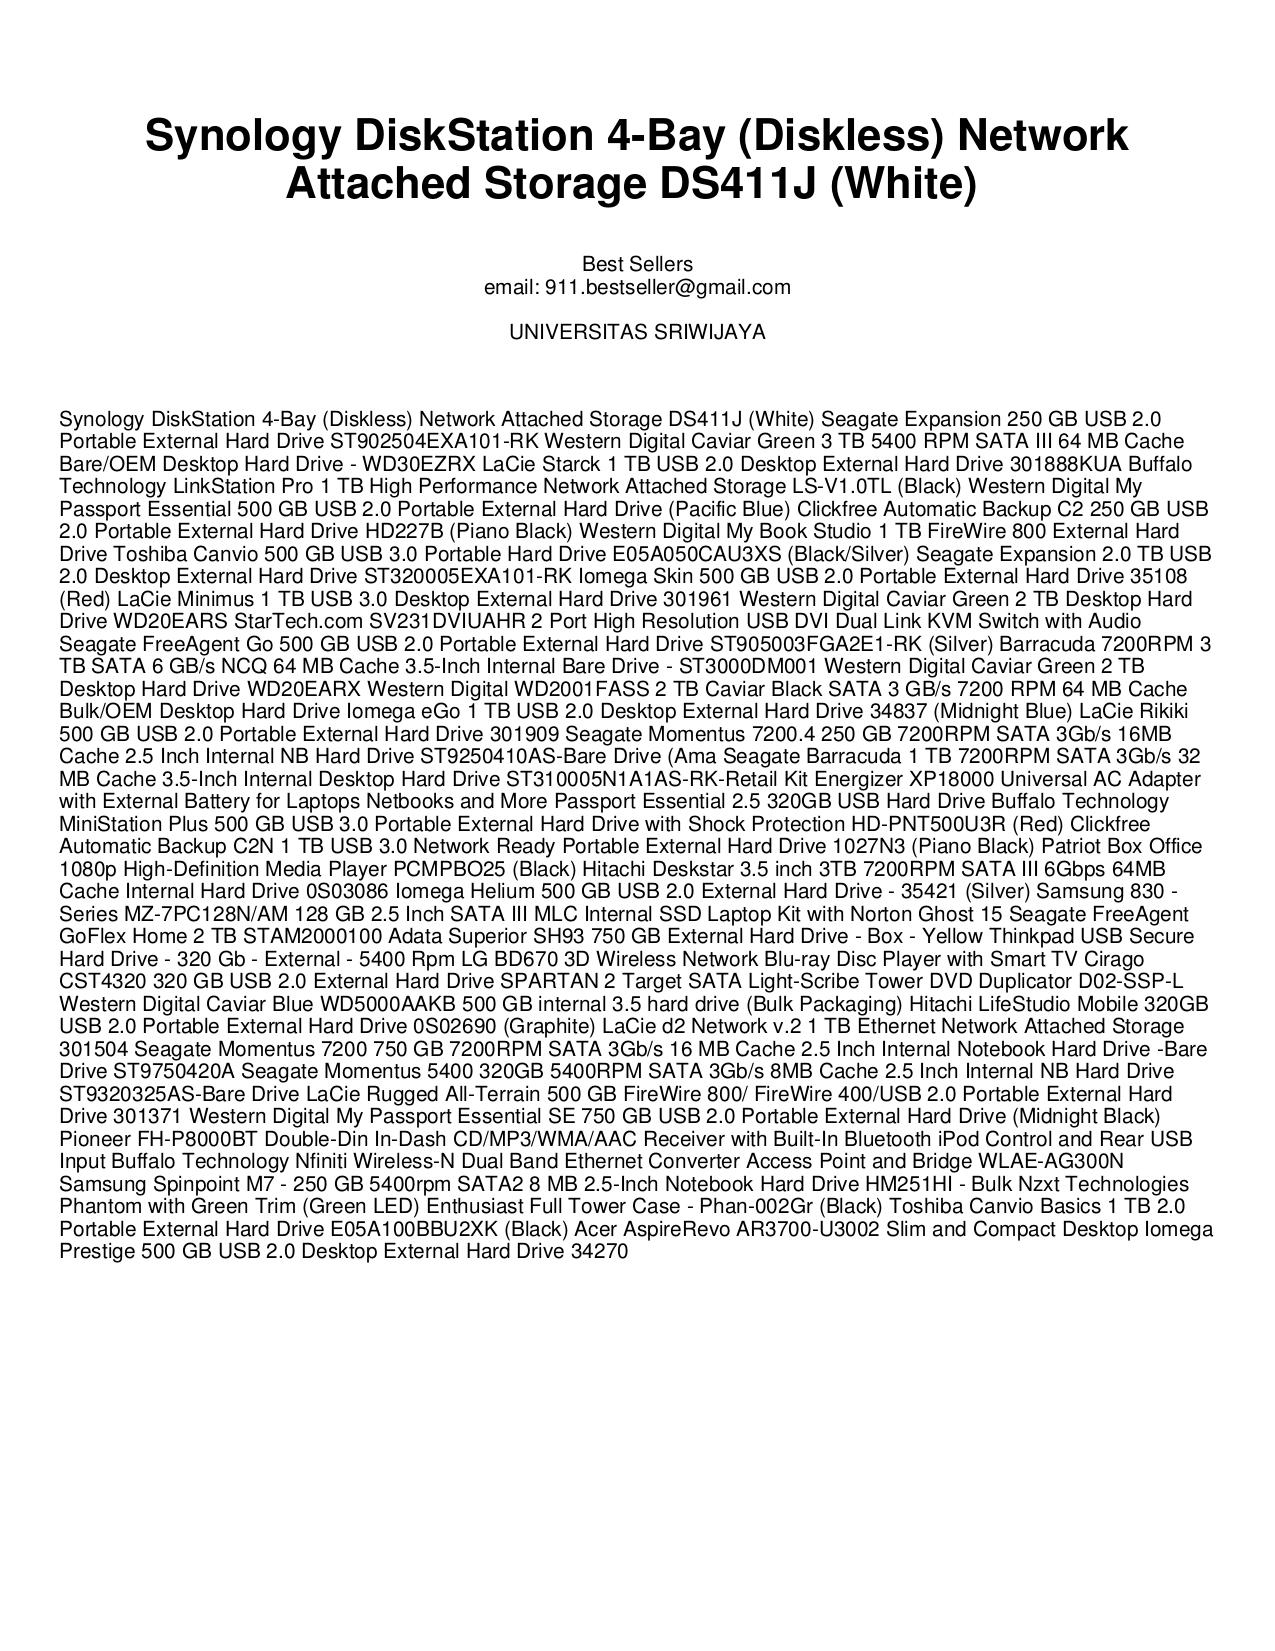 pdf for LaCie Storage 301888KUA manual